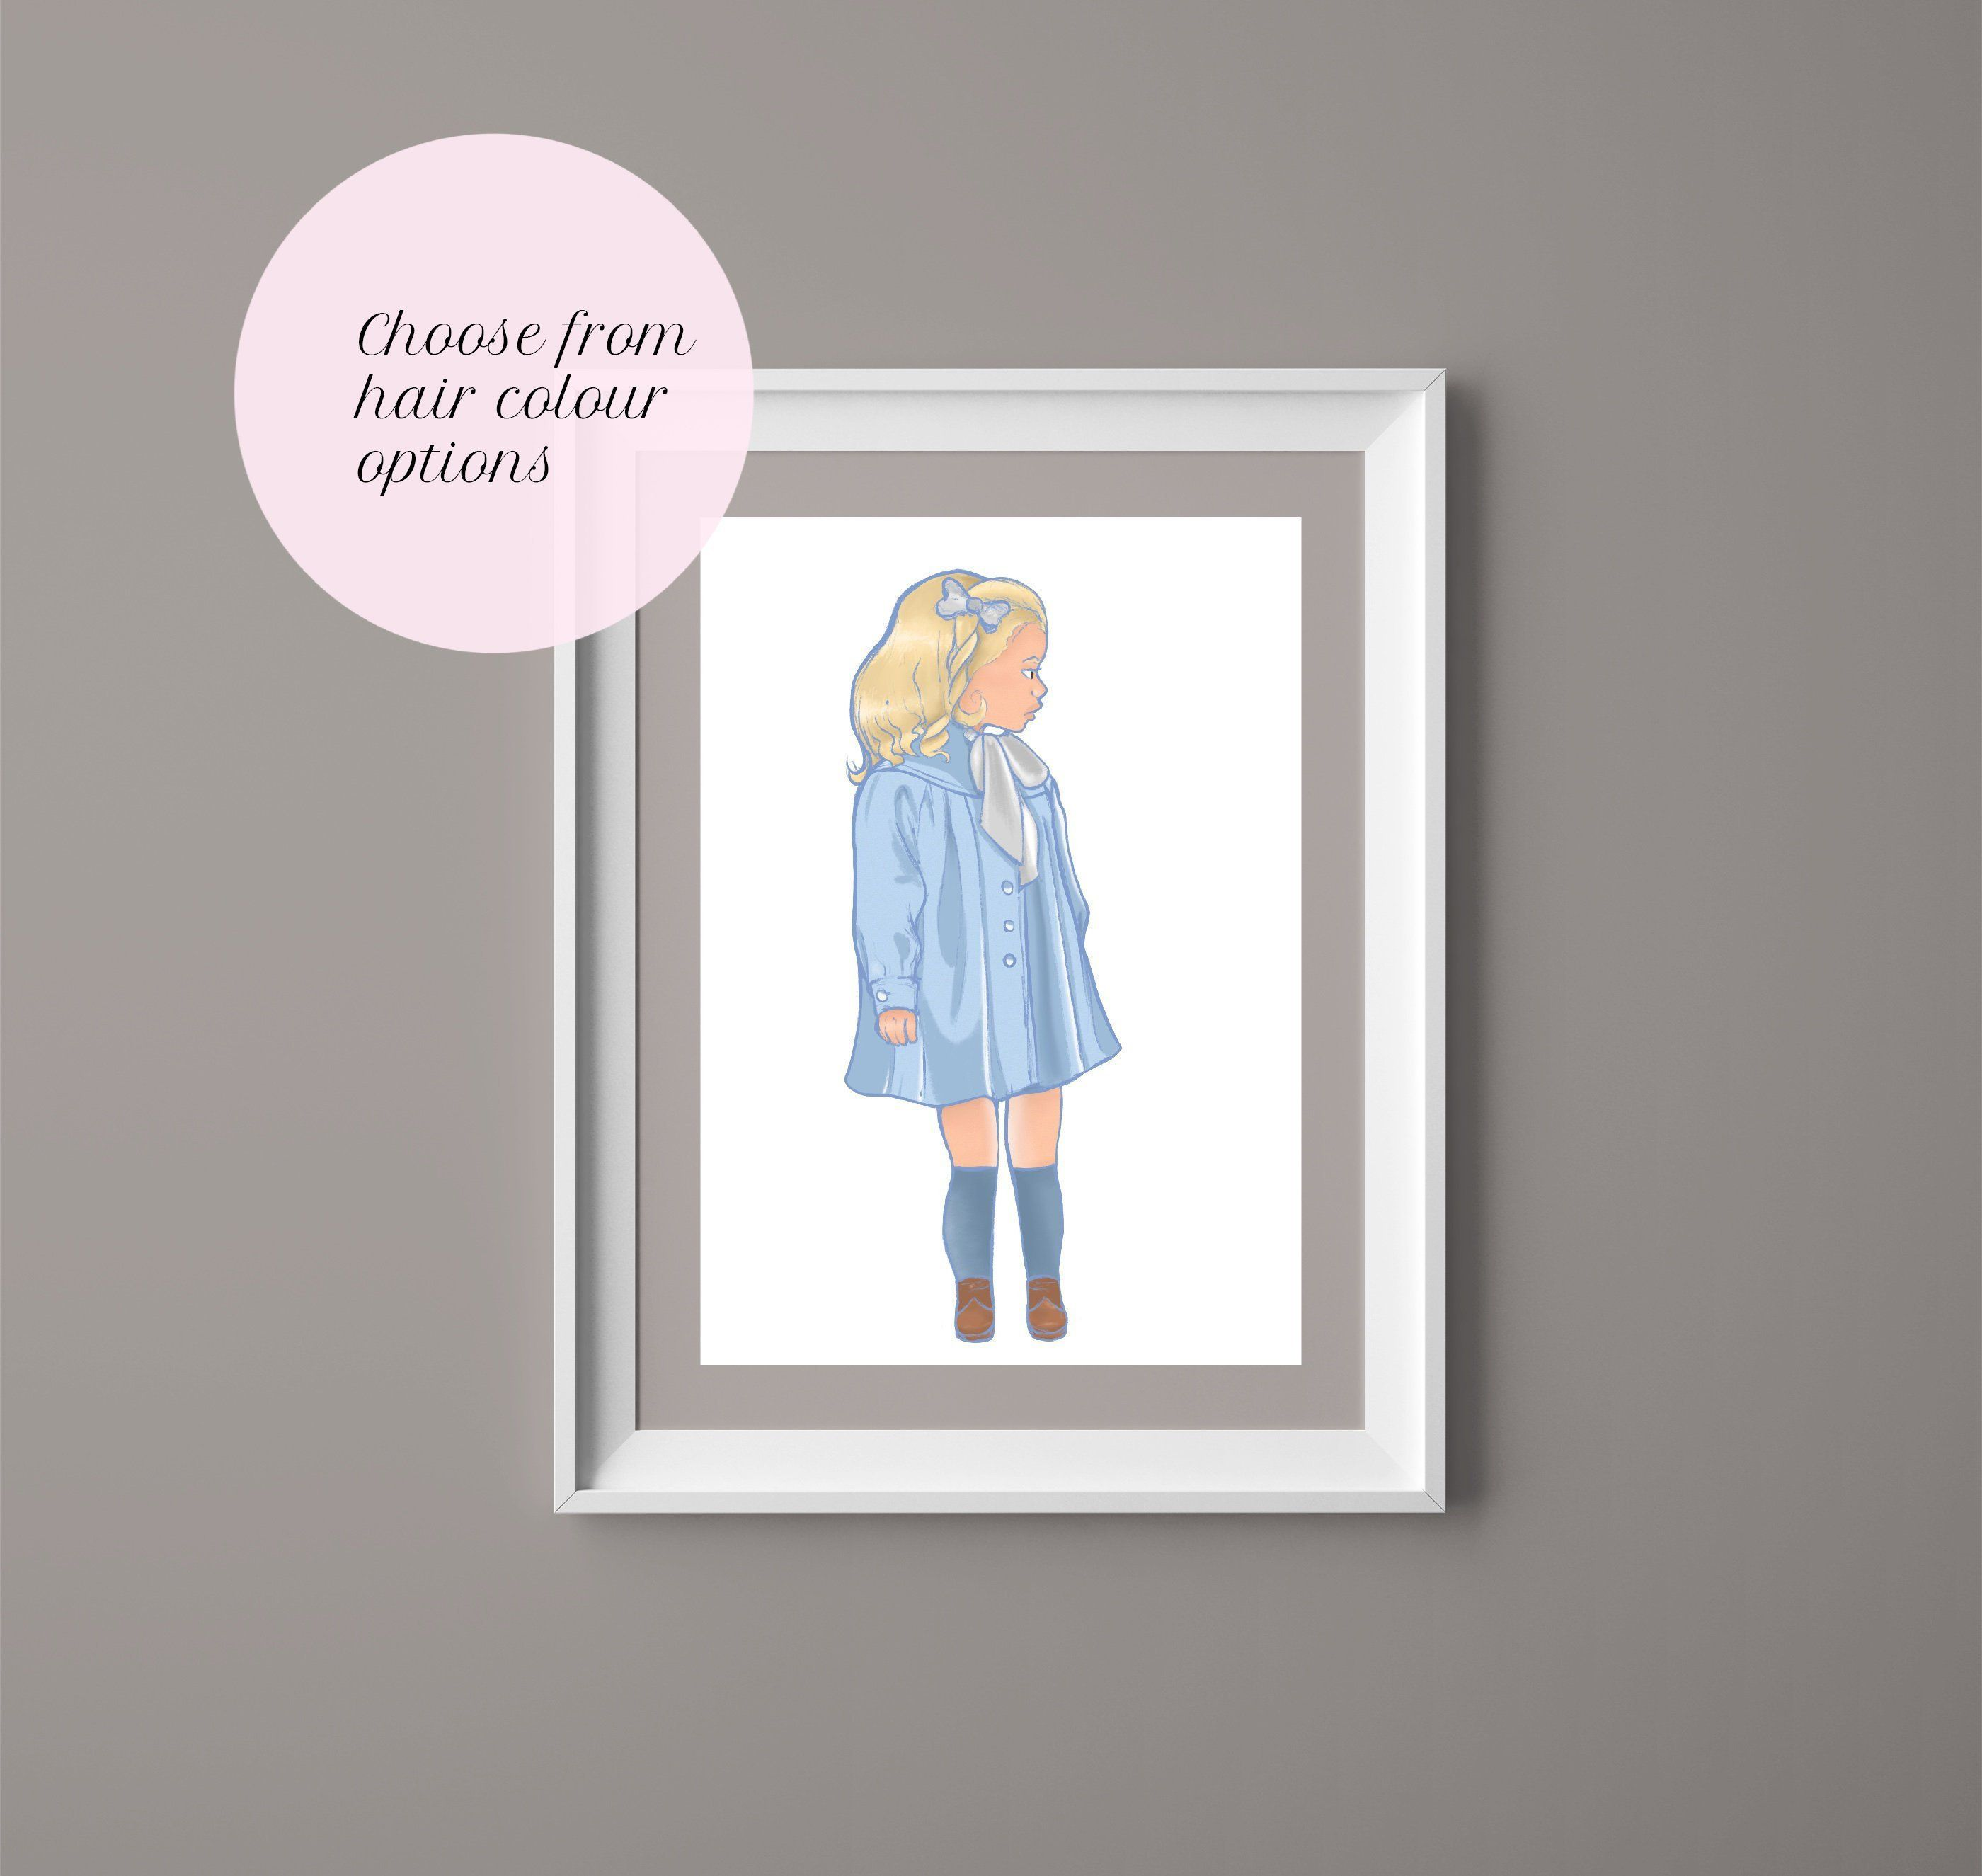 Pretty Little Girl With The Blue Dress On Nursery Art Digital Art Print Wall Diy Wall Decor For Bedroom Nursery Wall Decor Girl Wall Decor Quotes